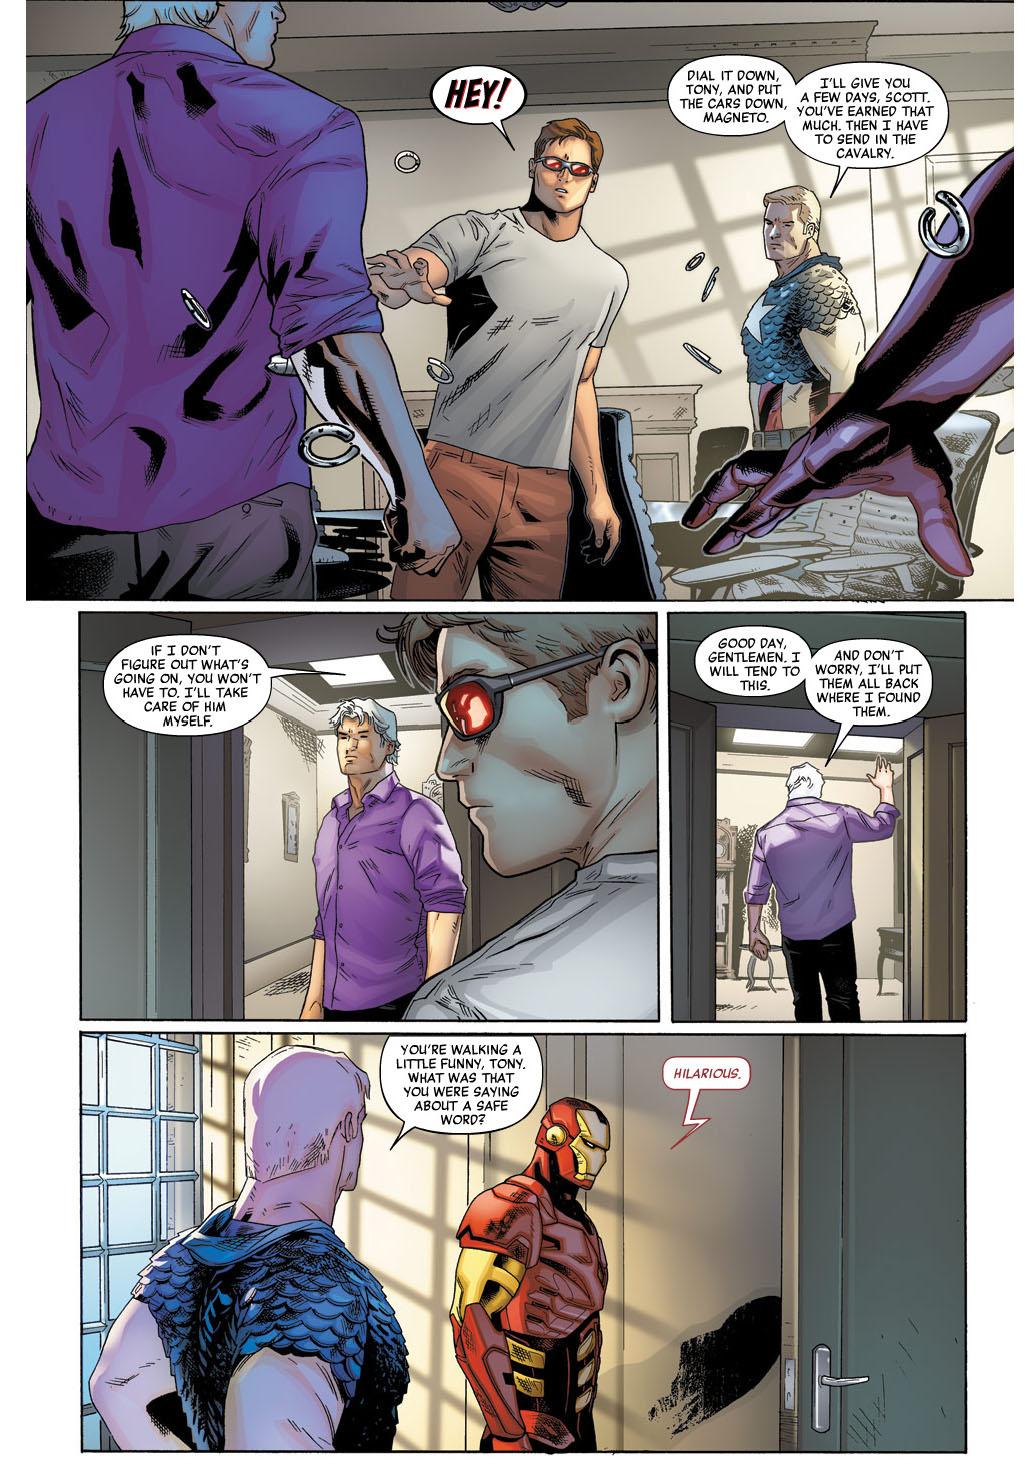 iron man and magneto standoff 3